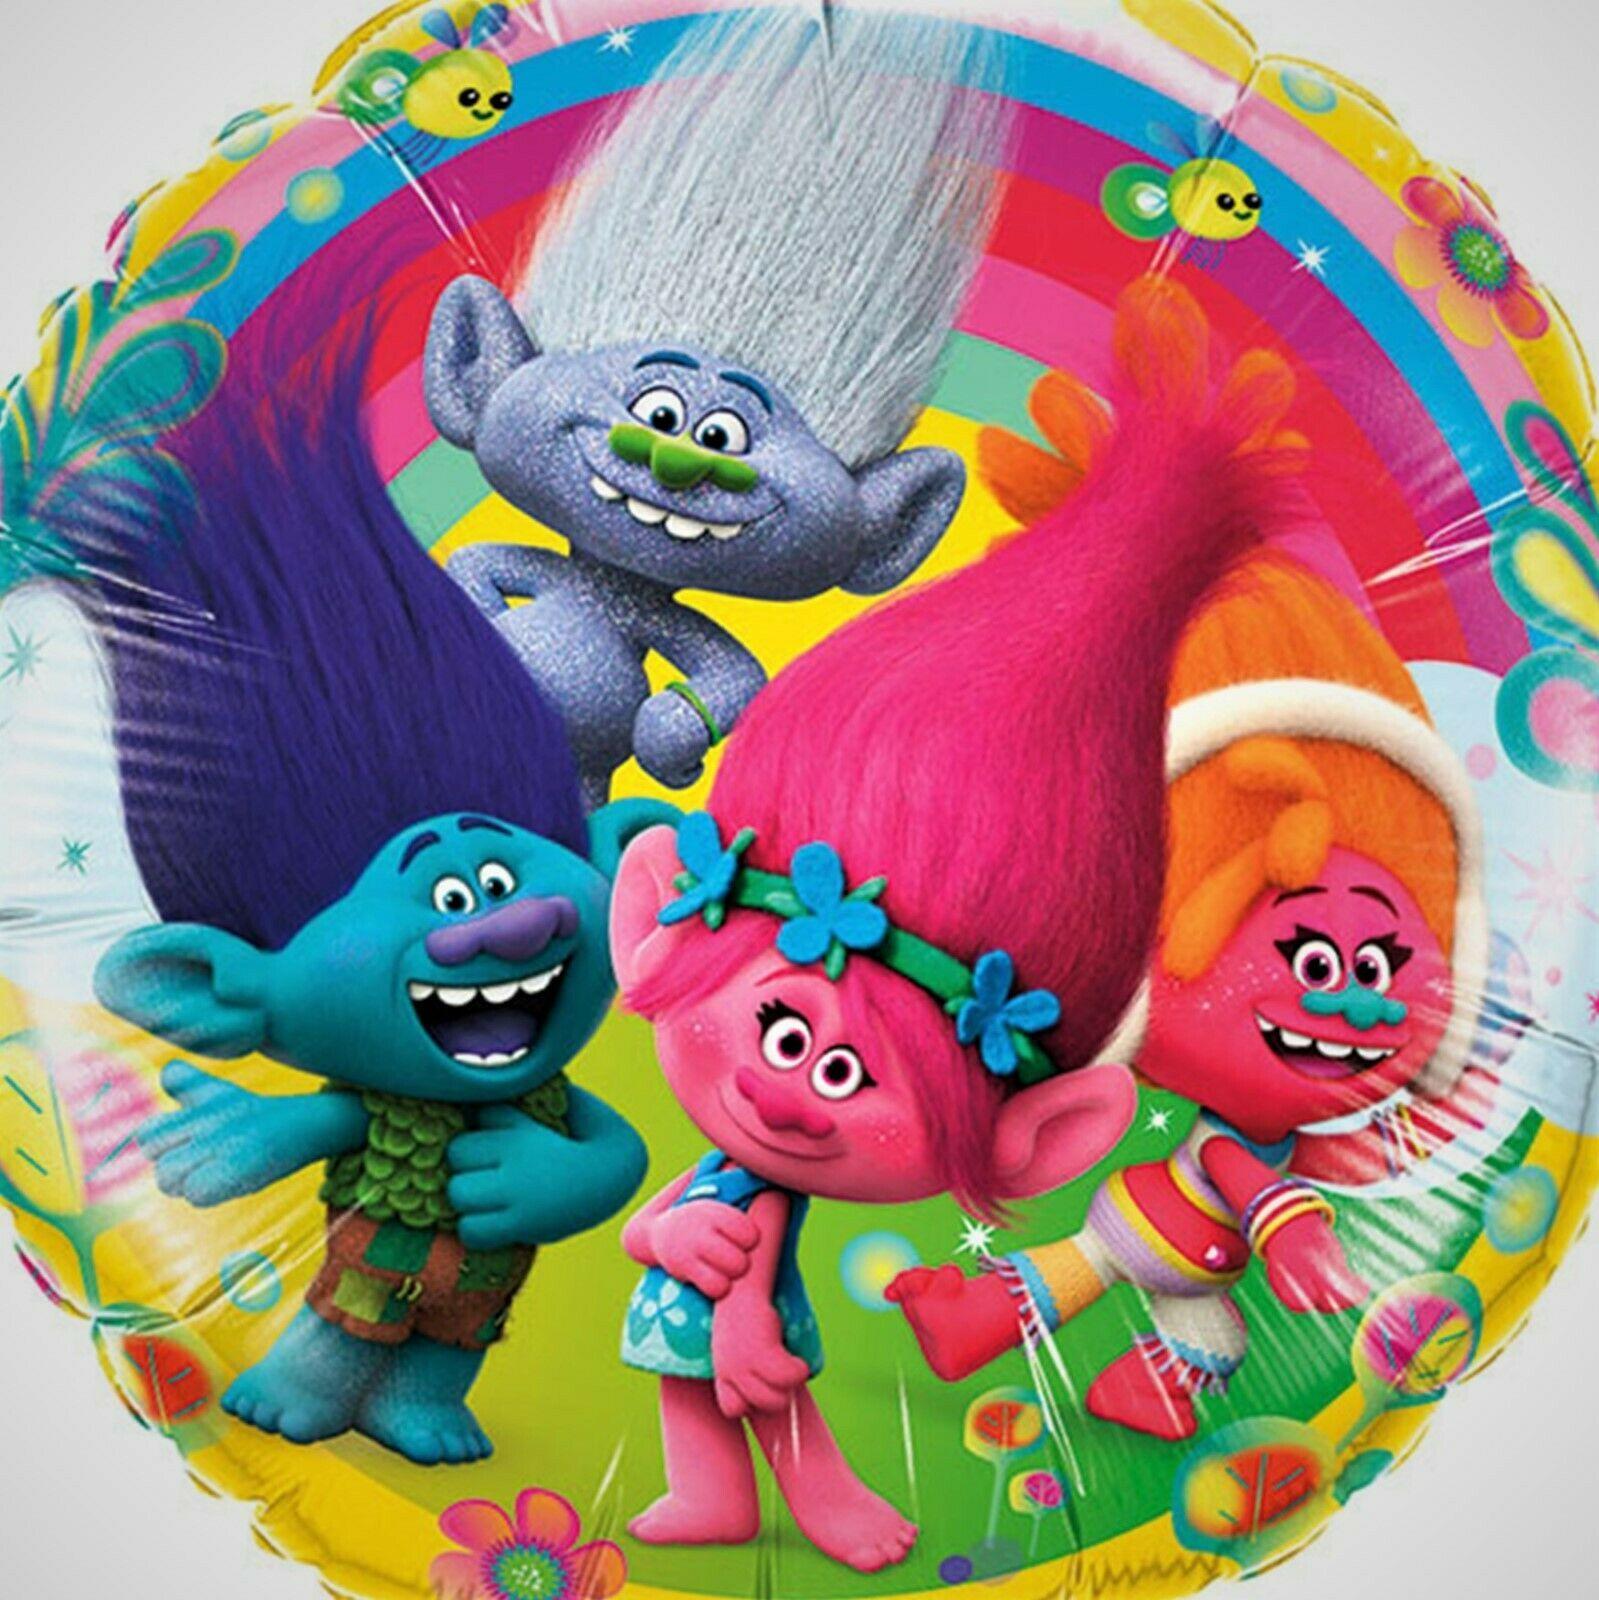 "2 x 18"" Trolls The Movie Dreamworks Refillable Foil Mylar Party Balloon - $11.70"